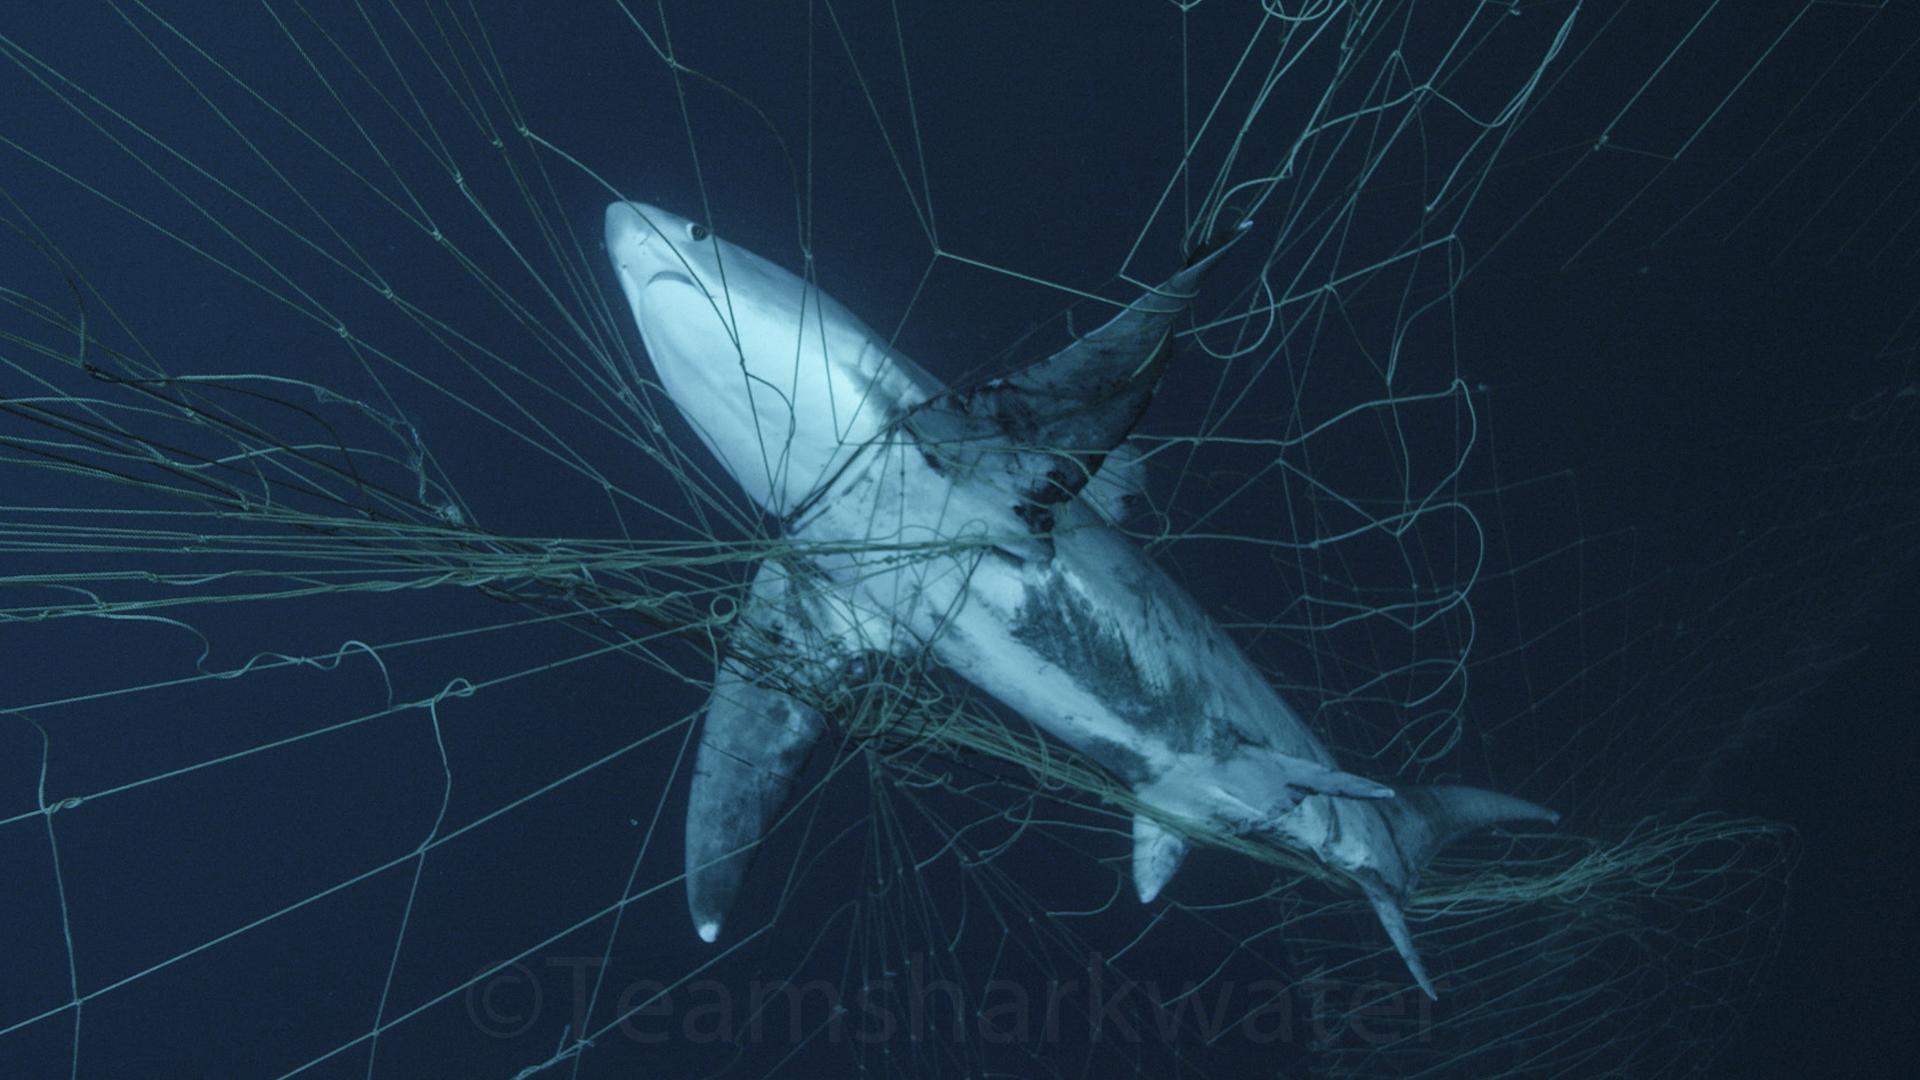 Attempts to Establish Hard Caps on West Coast Drift Gillnet Fishery Questionable